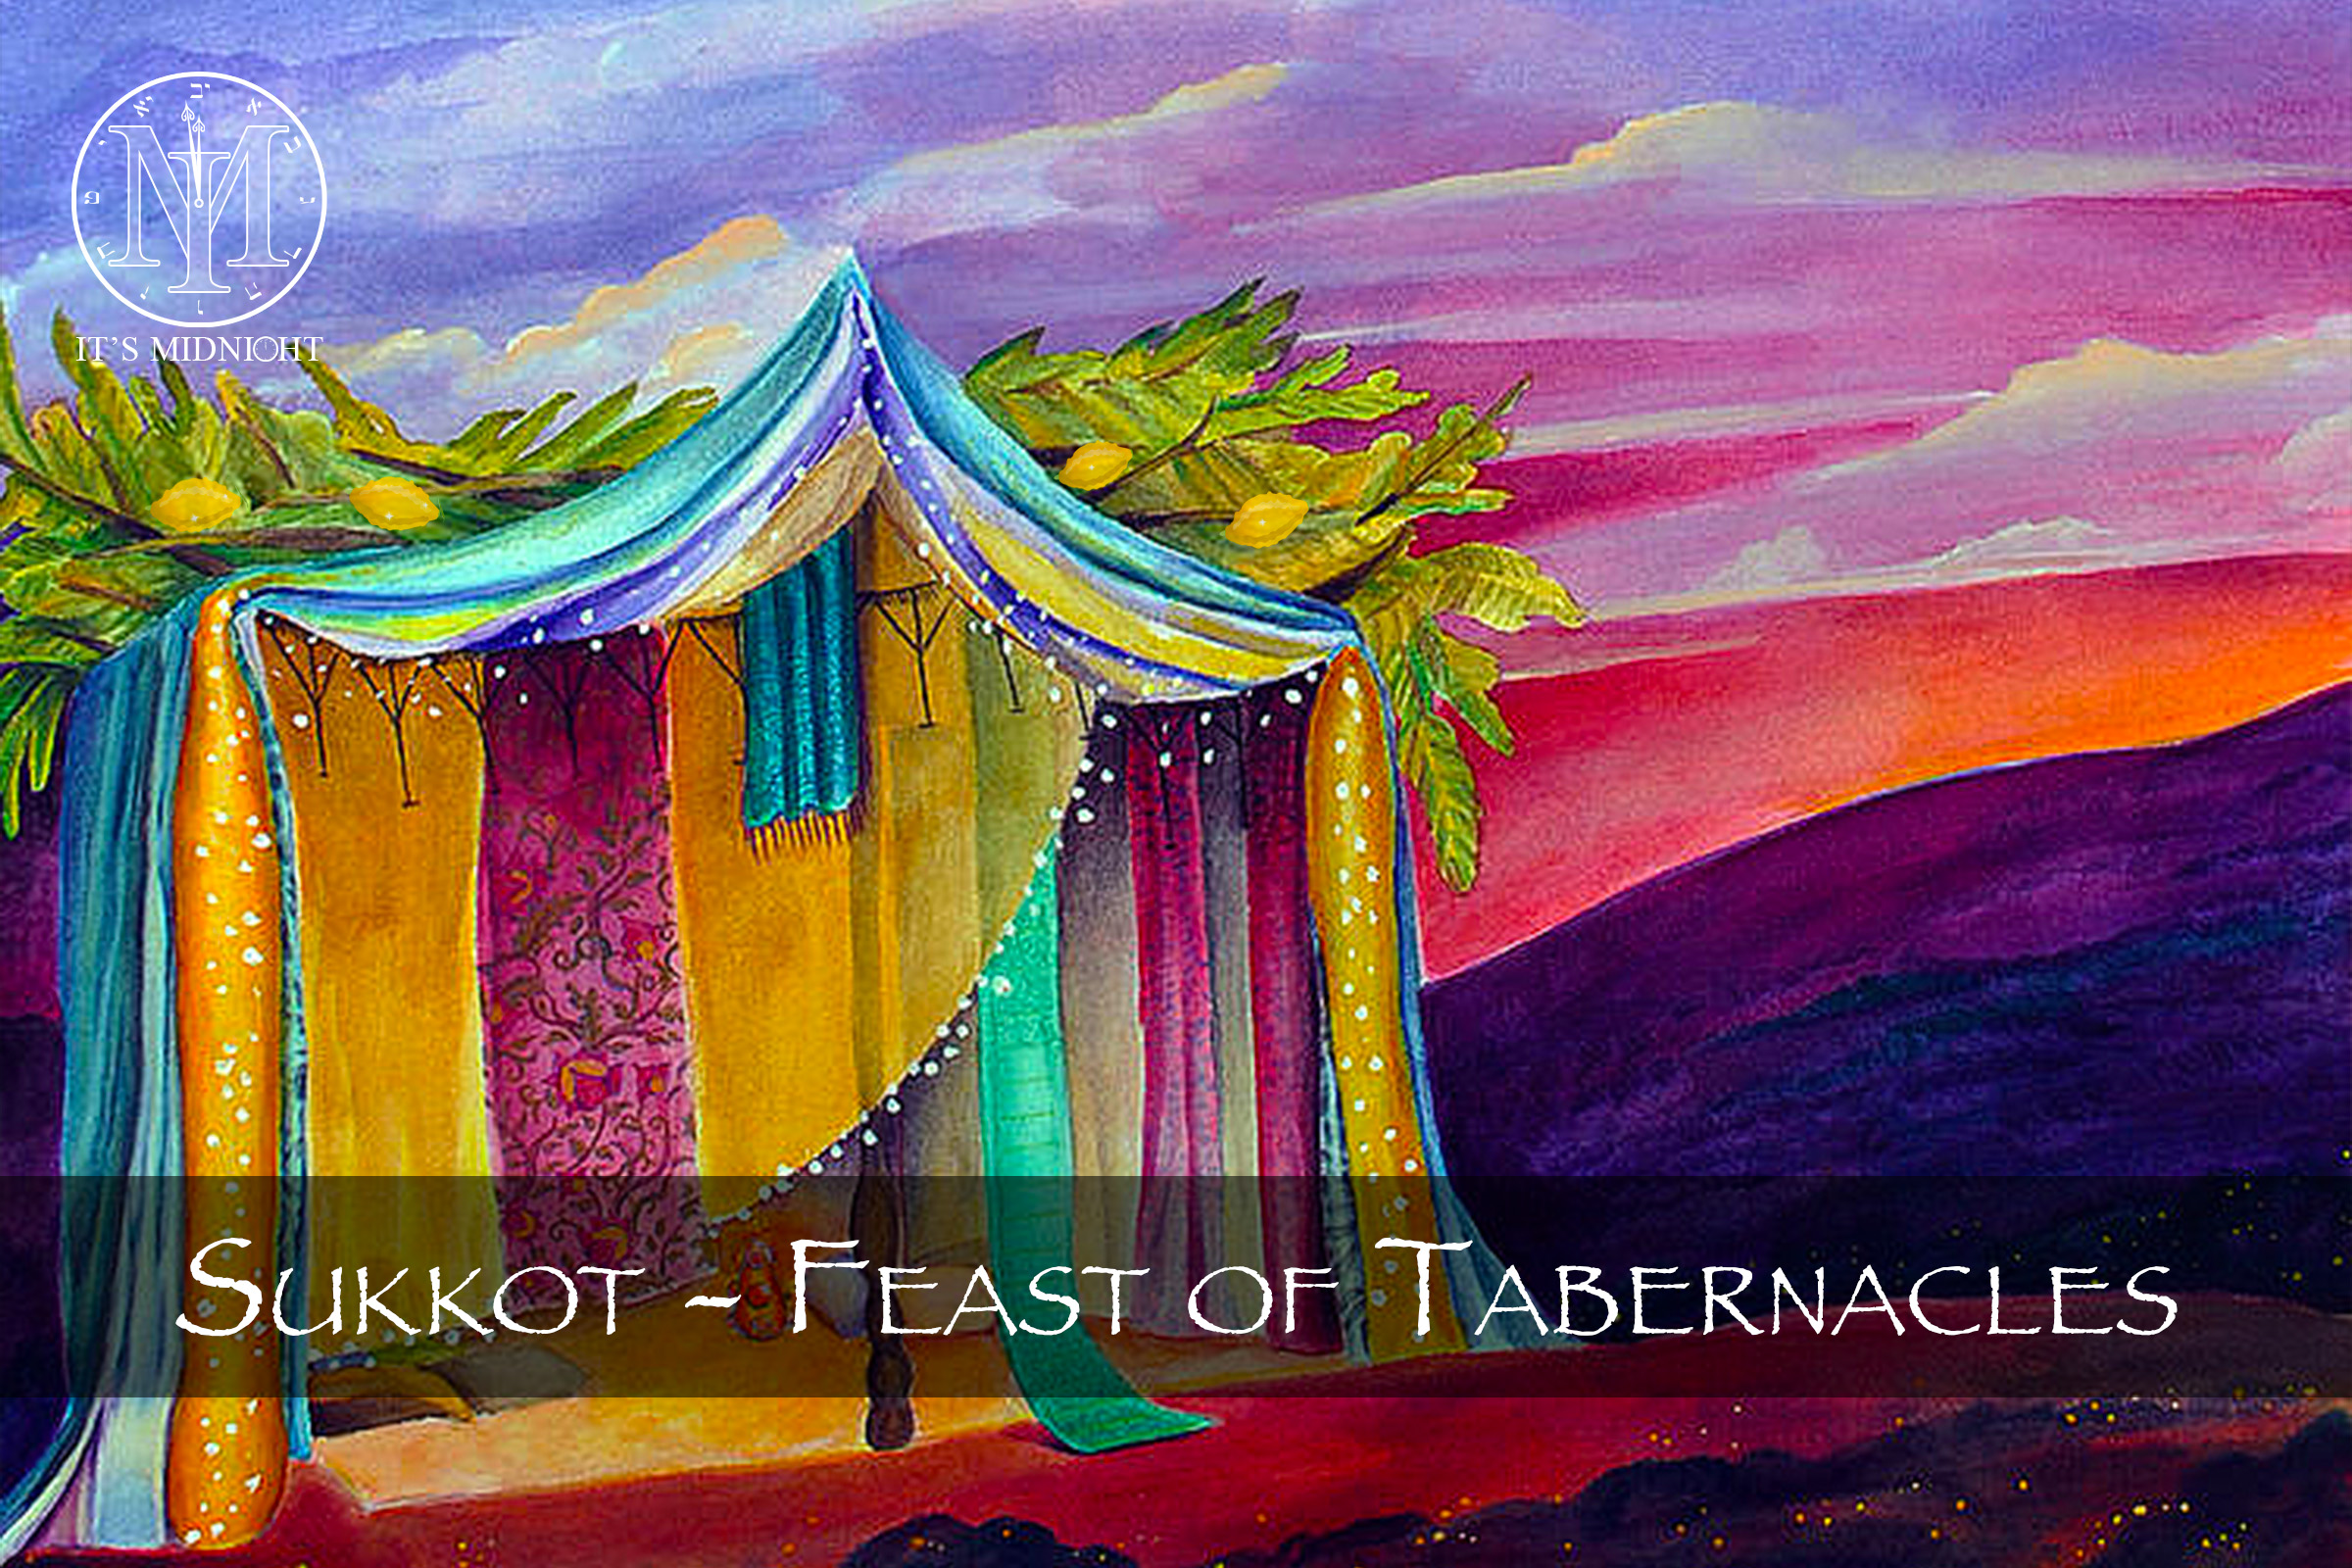 Sukkot - Feast of Tabernacles (Audio Thumbnail).jpg